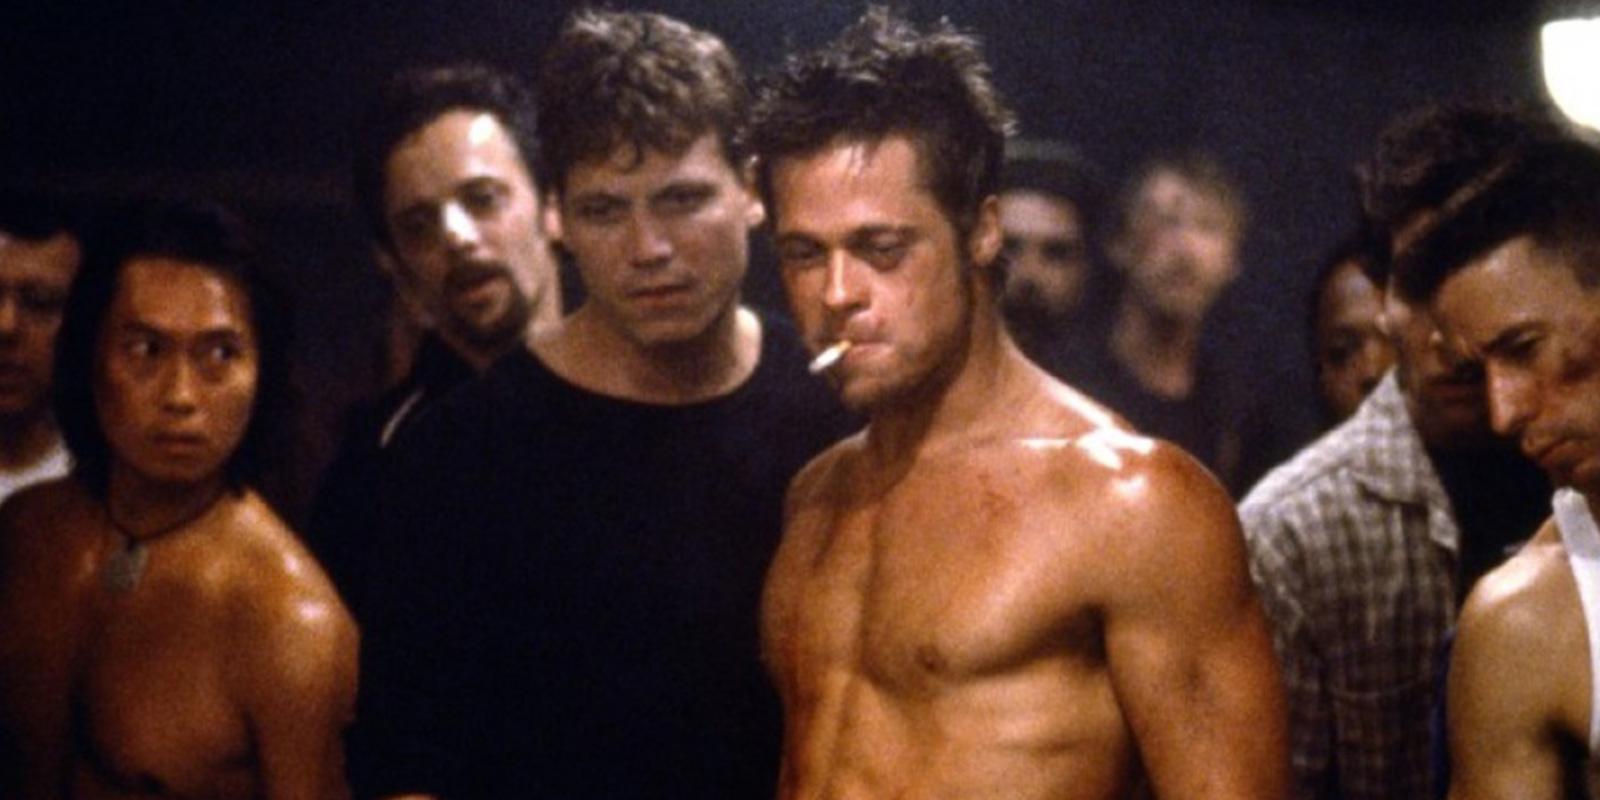 How To Get A Body Like Brad Pitt In Fight Club